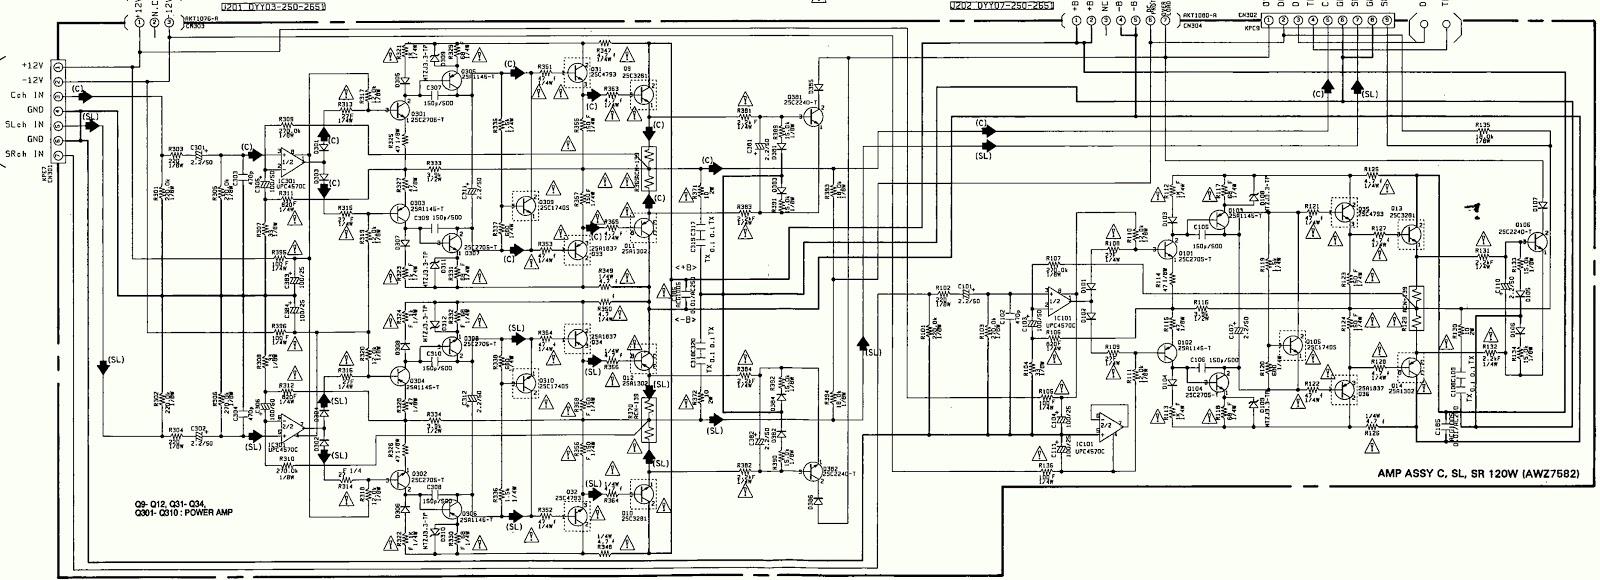 pioneer vsx d3s power amplifier section circuit diagram rh schematicscom blogspot com pioneer power amplifier circuit diagram pioneer power amplifier schematic diagram